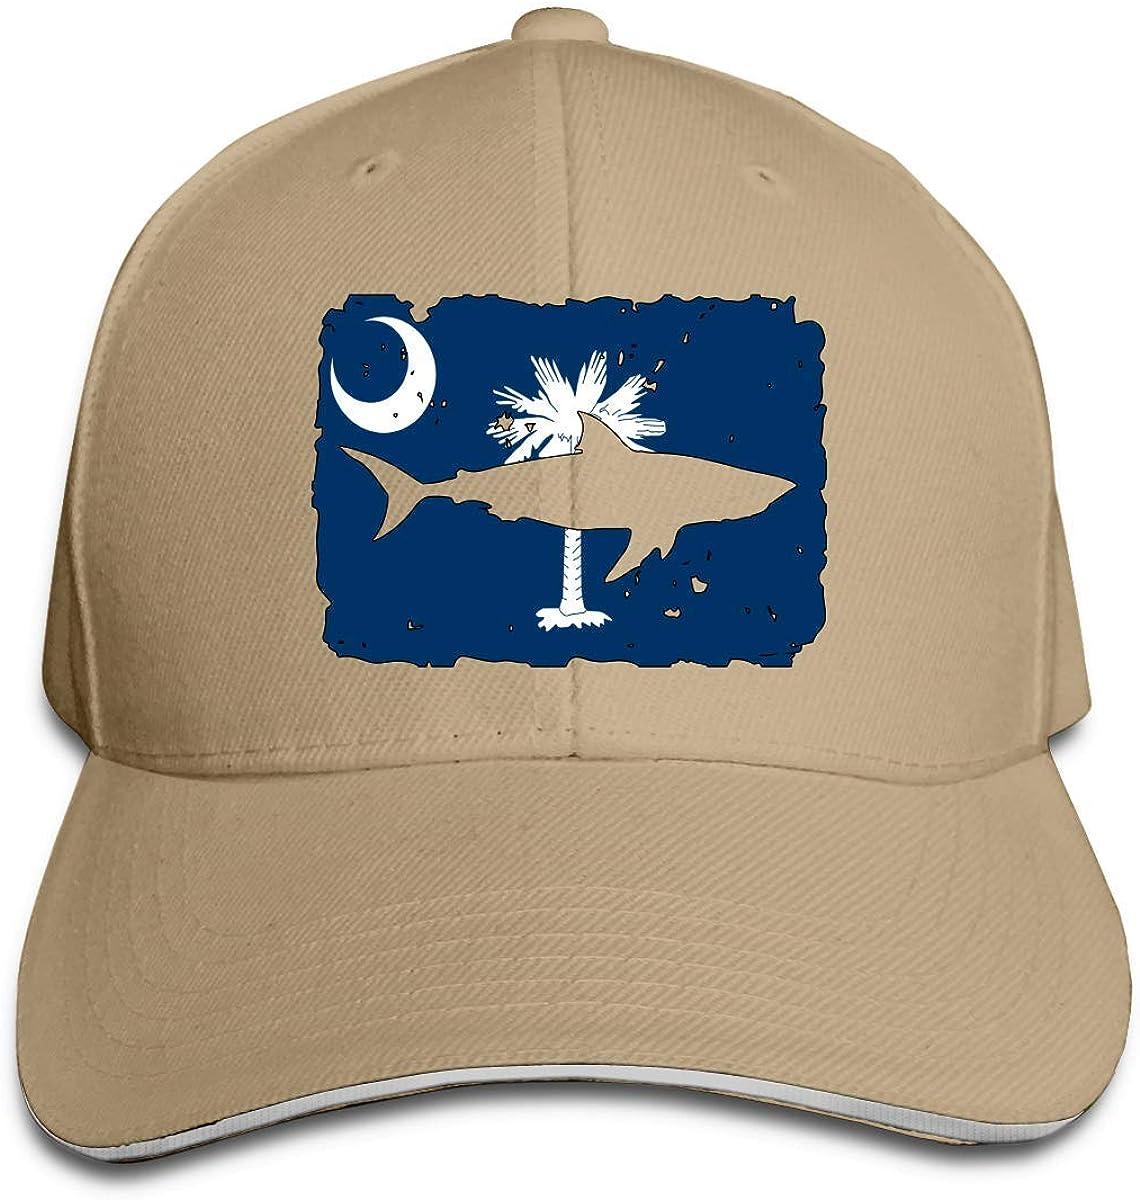 Baseball Cap Dad Hat Peaked Flat Trucker Hats Adjustable for Men Women